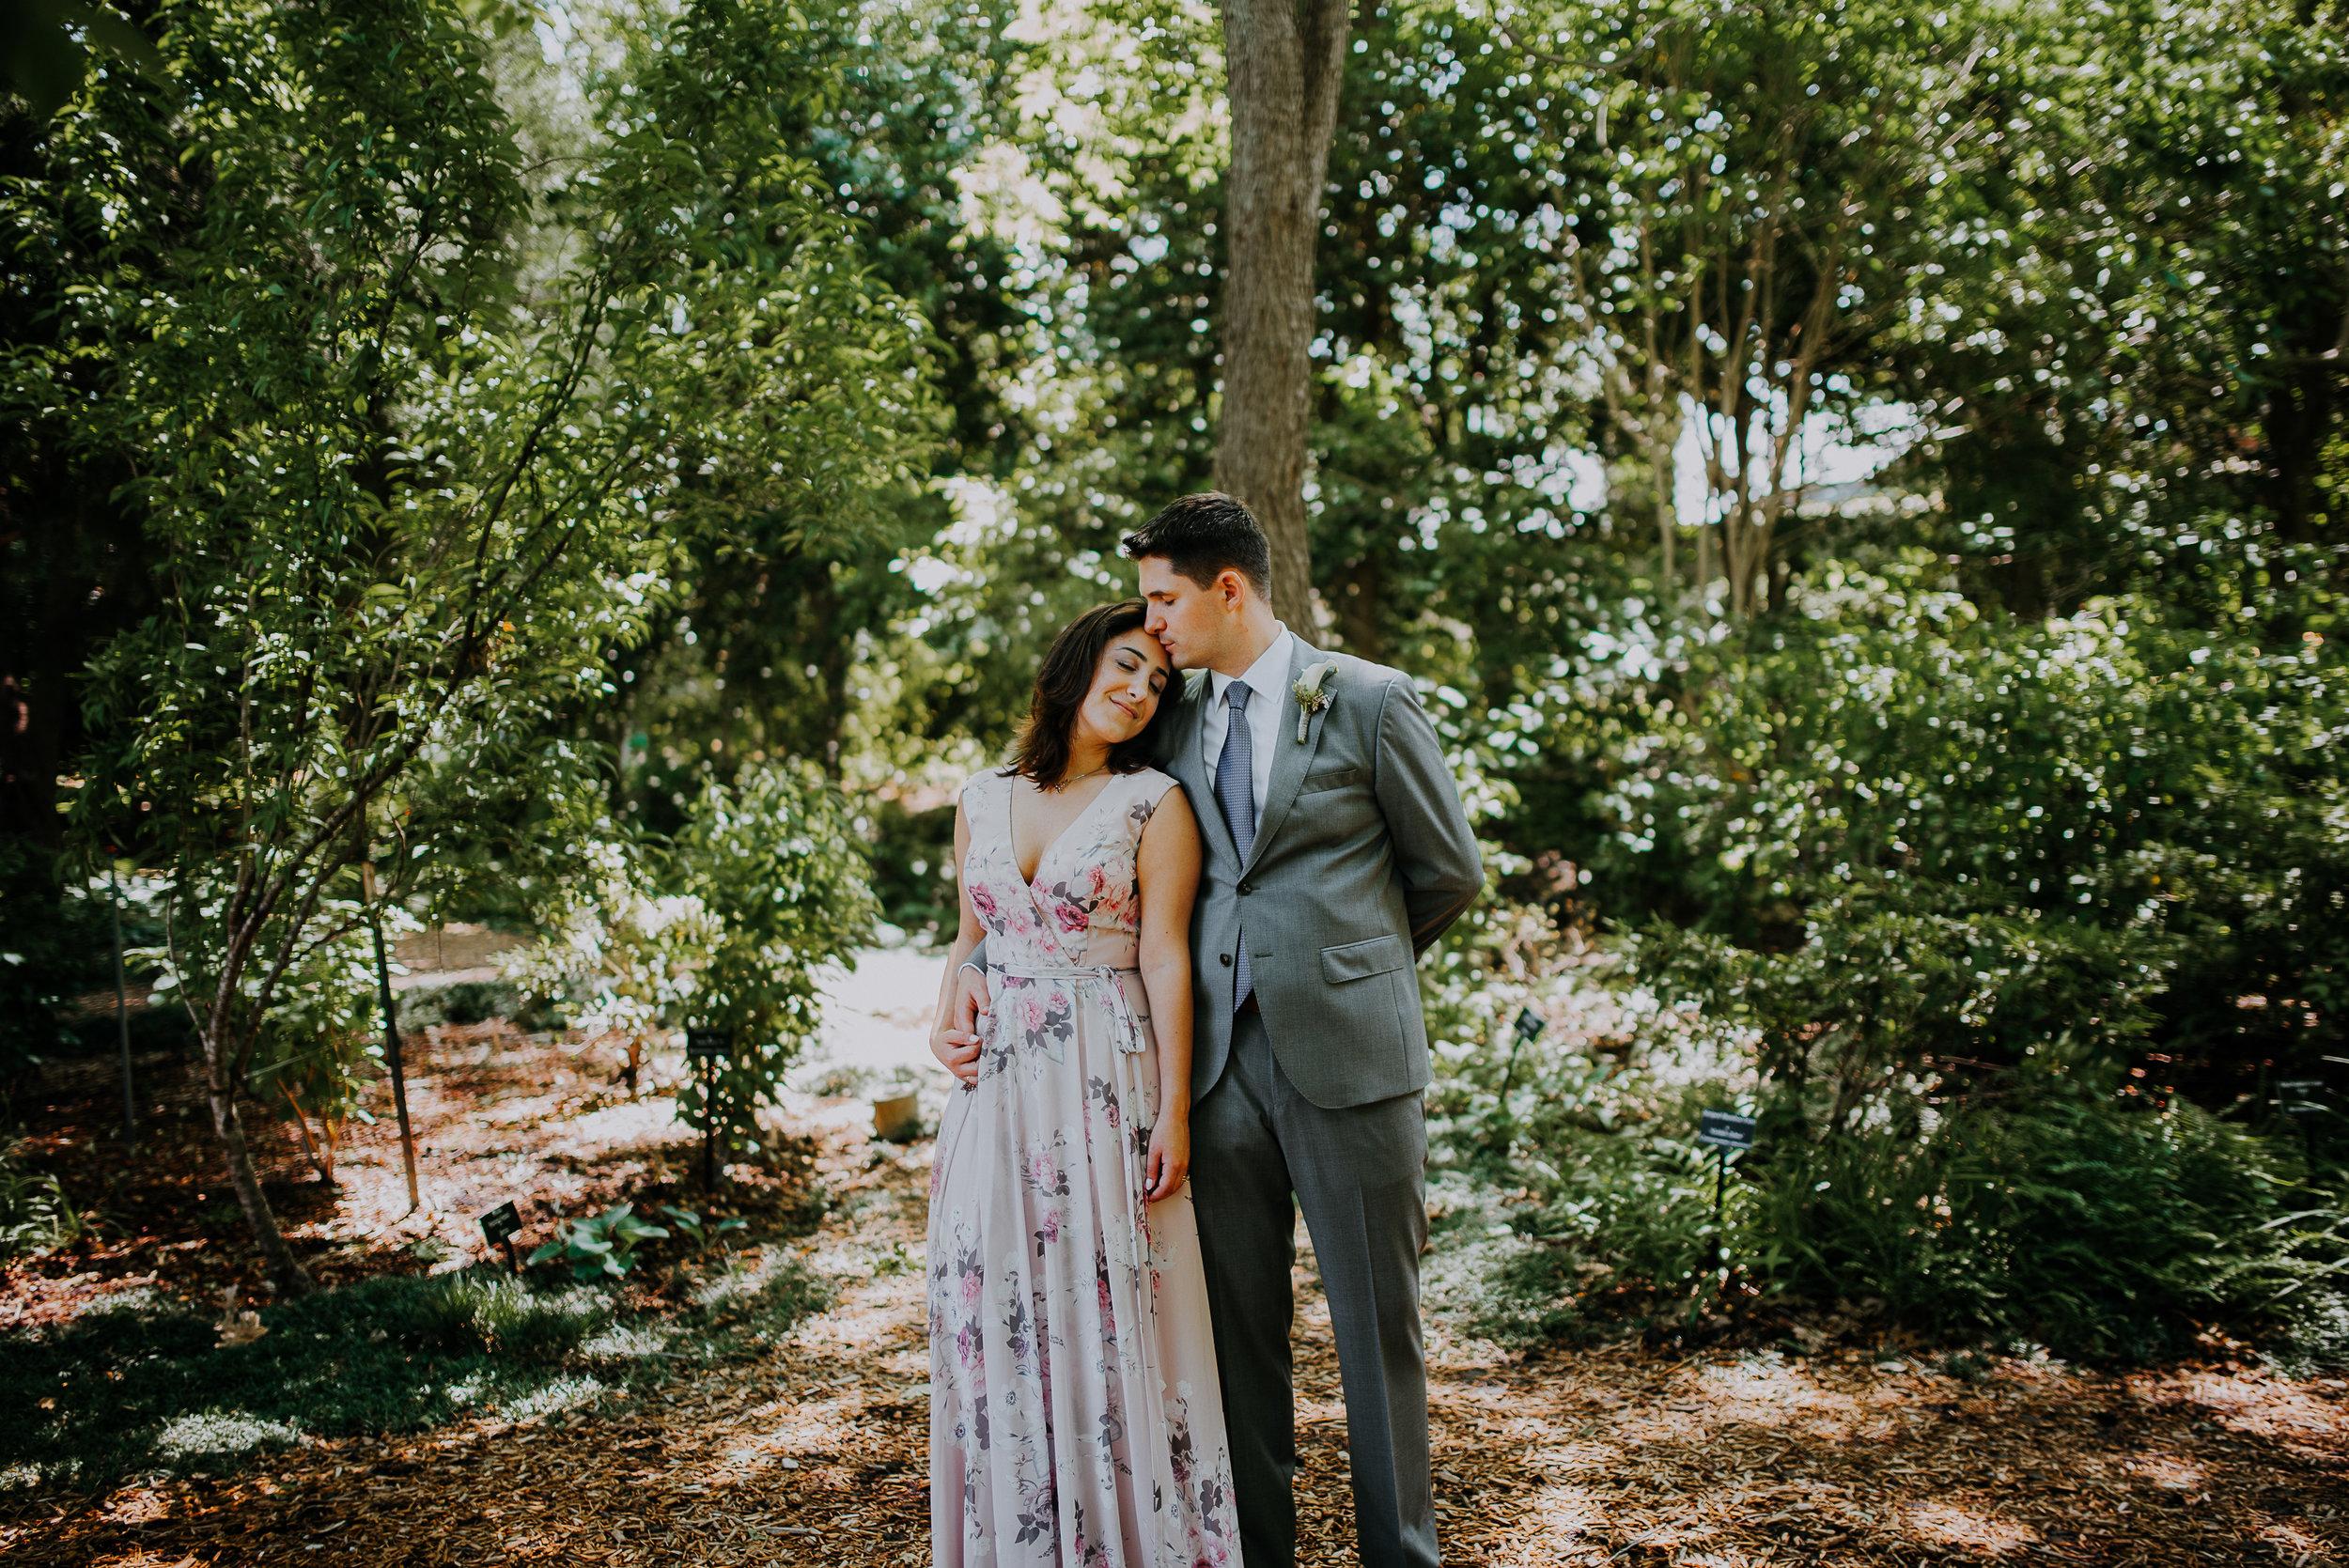 Dallas-fort-worth-wedding-photographer-dallas-arboretum-intimate-wedding-dallas-texas-25